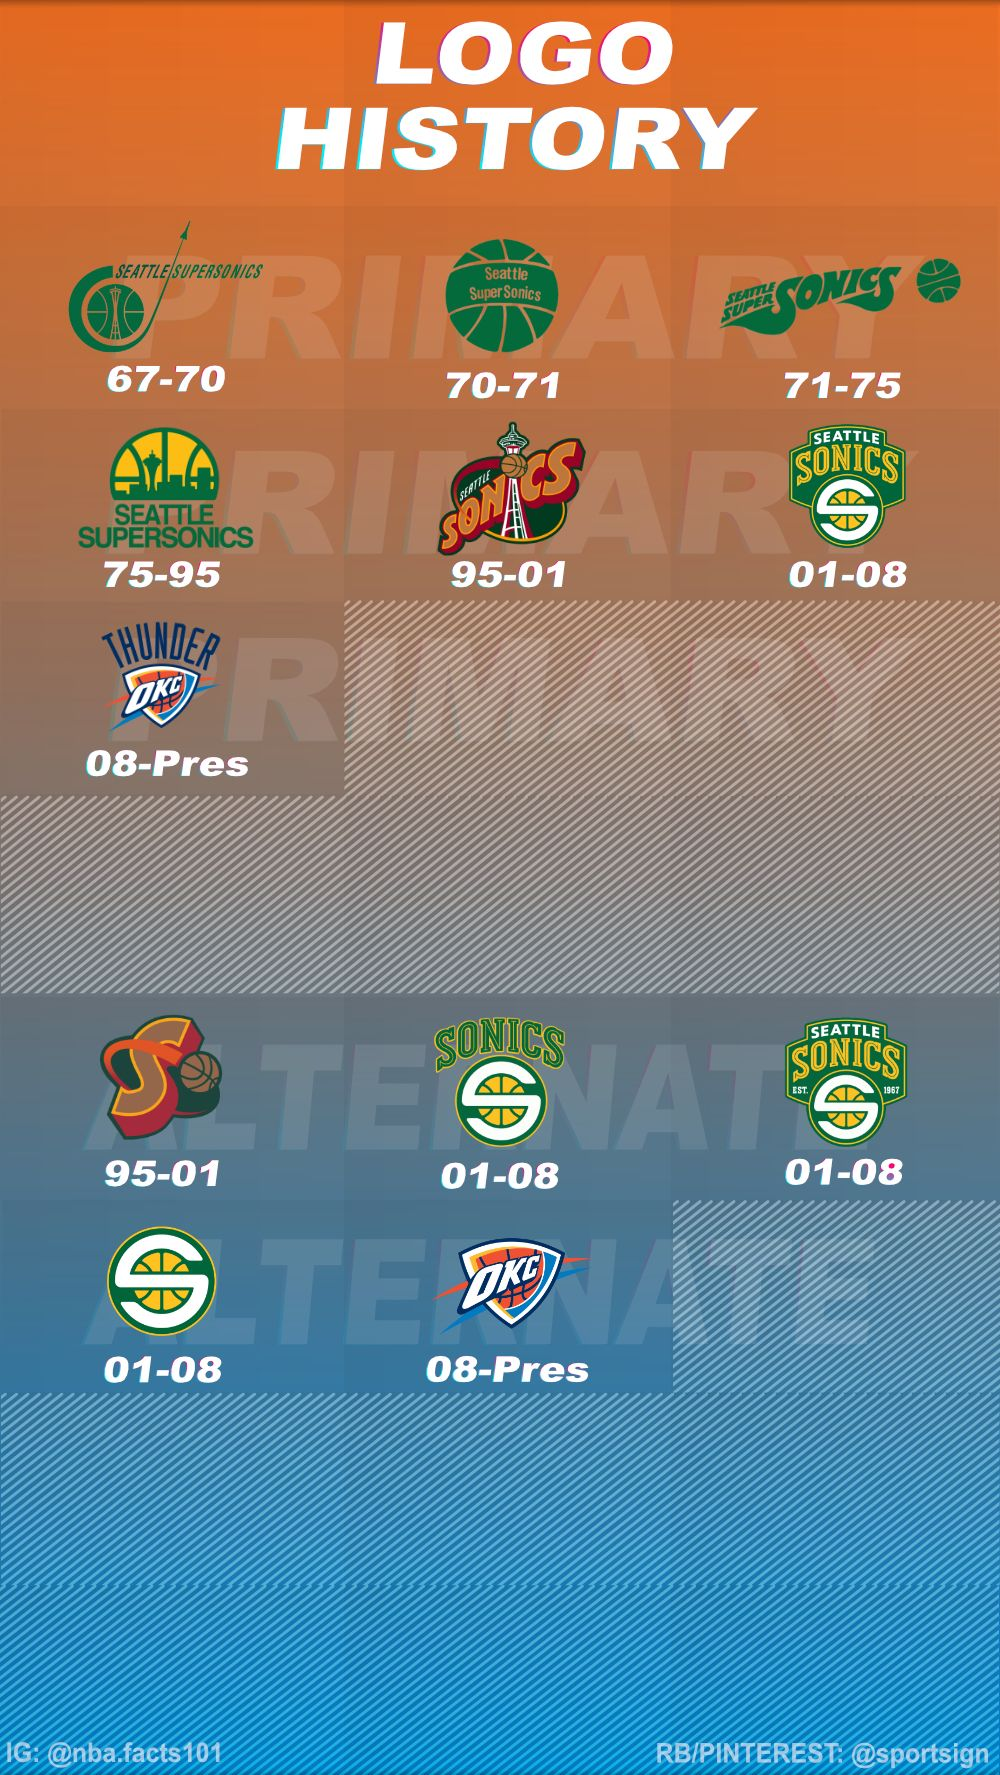 History of the NBA Basketball Team Oklahoma City Thunder